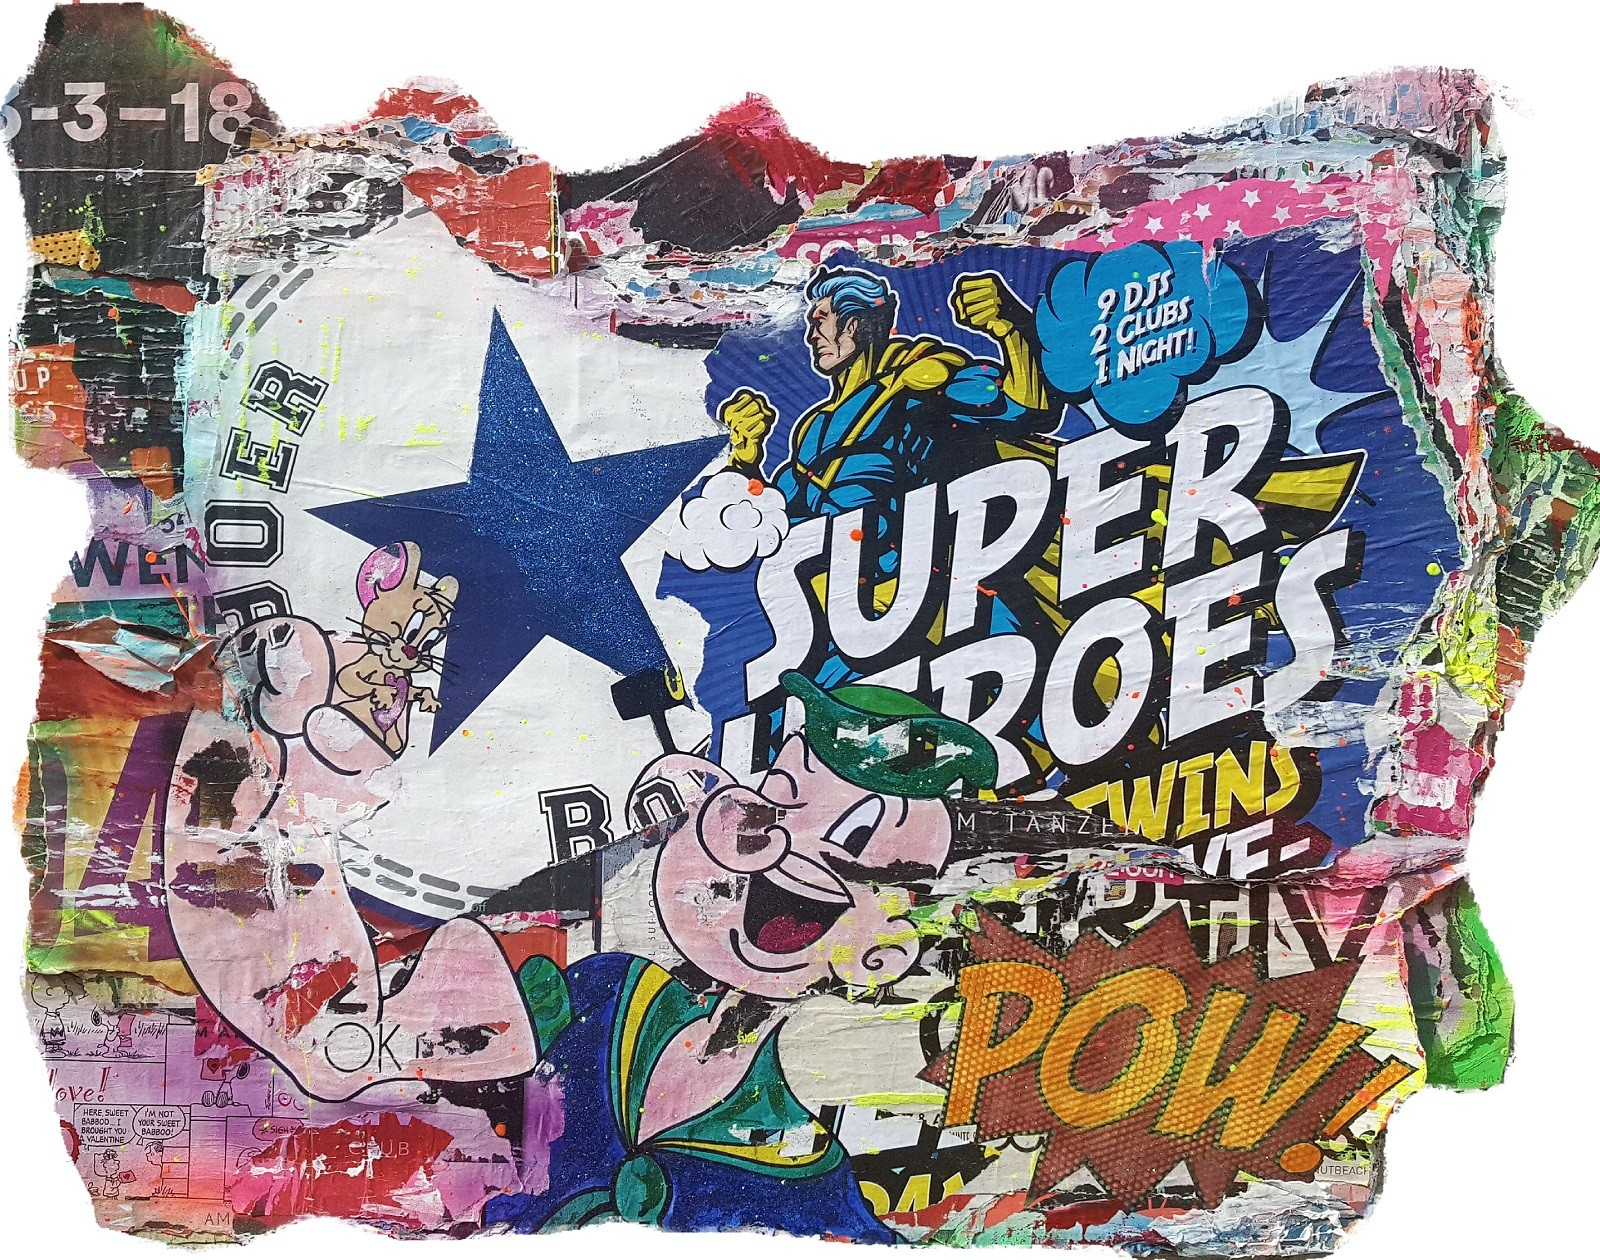 Superhelden - Popeye & Jerry - Kiesewalter, Tanja - k-TK14